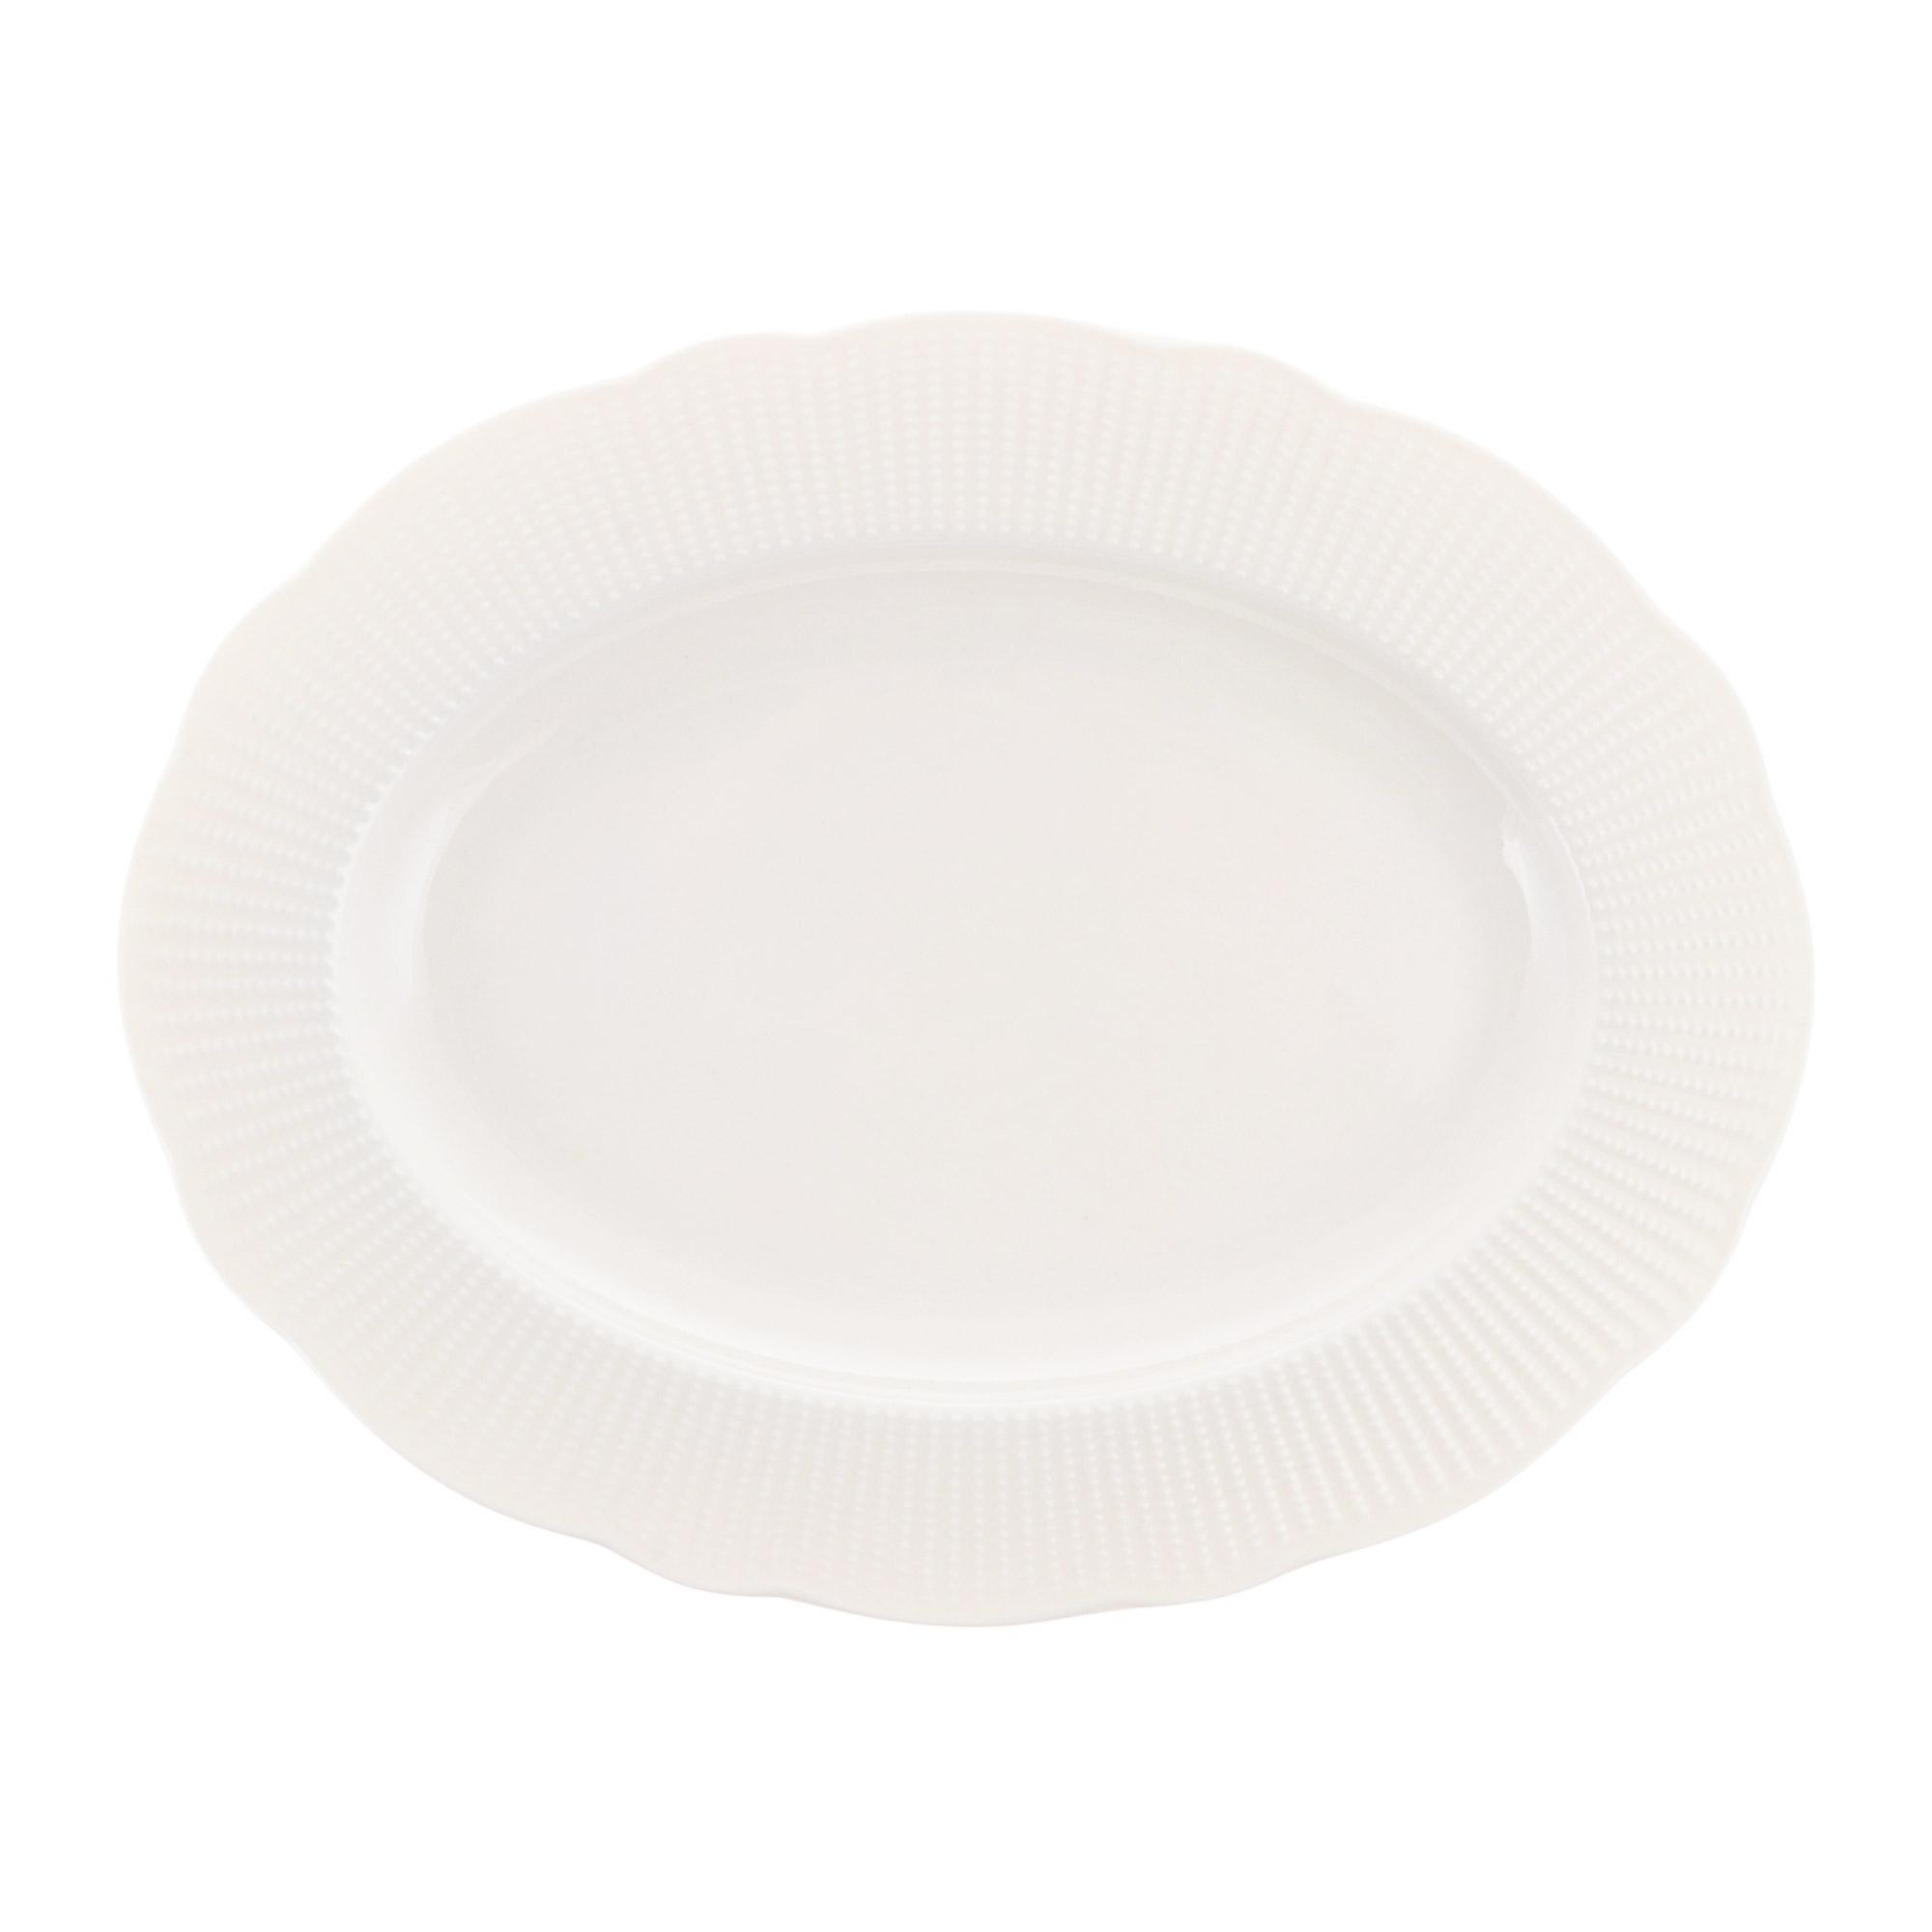 Фото - Блюдо овальное 28 см Kutahya Porselen ilay недекорированное блюдо овальное газания 28 см prt bg06600 x 20 portmeirion